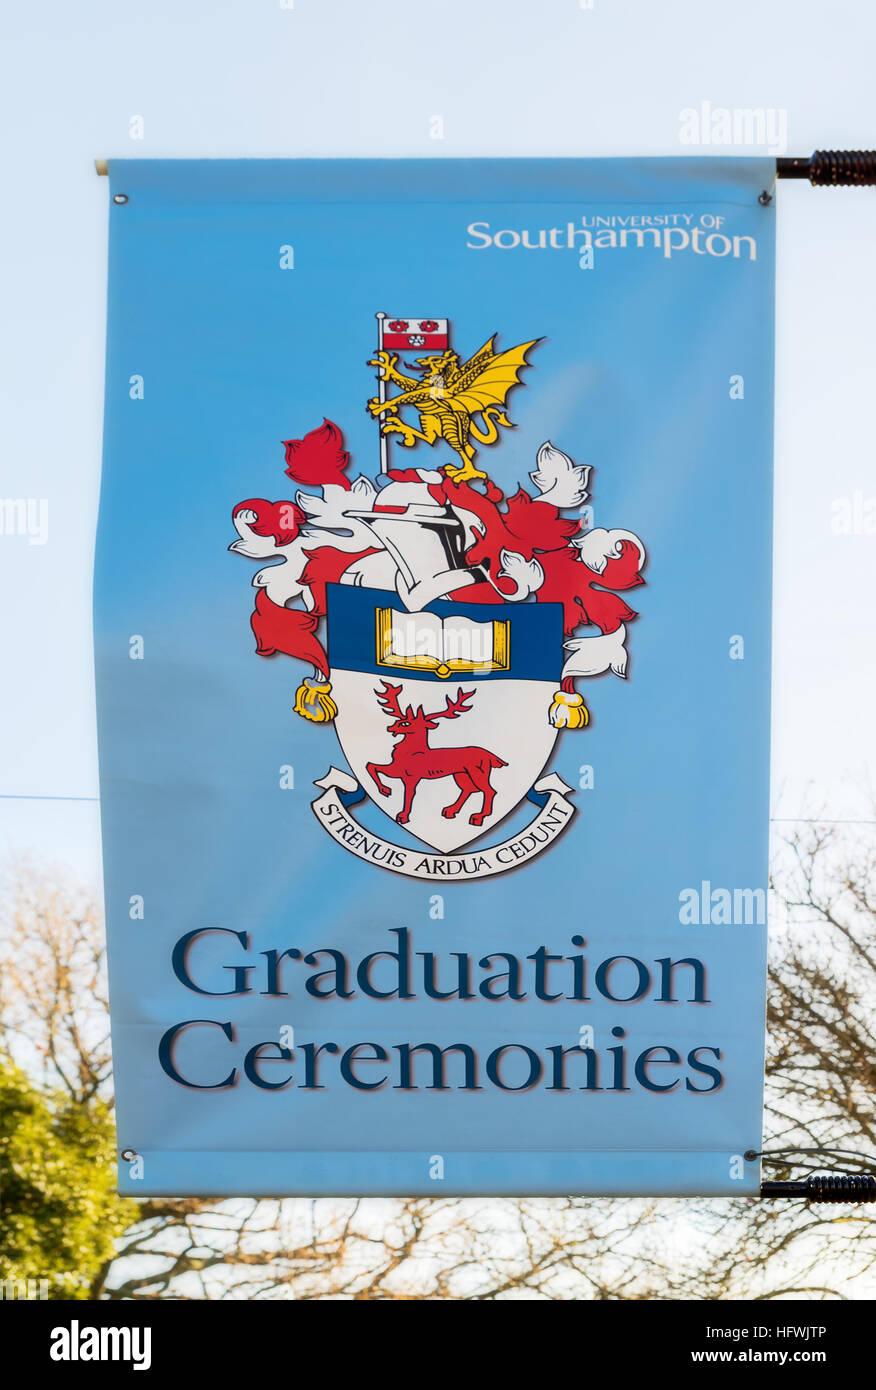 Graduation ceremonies. - Stock Image